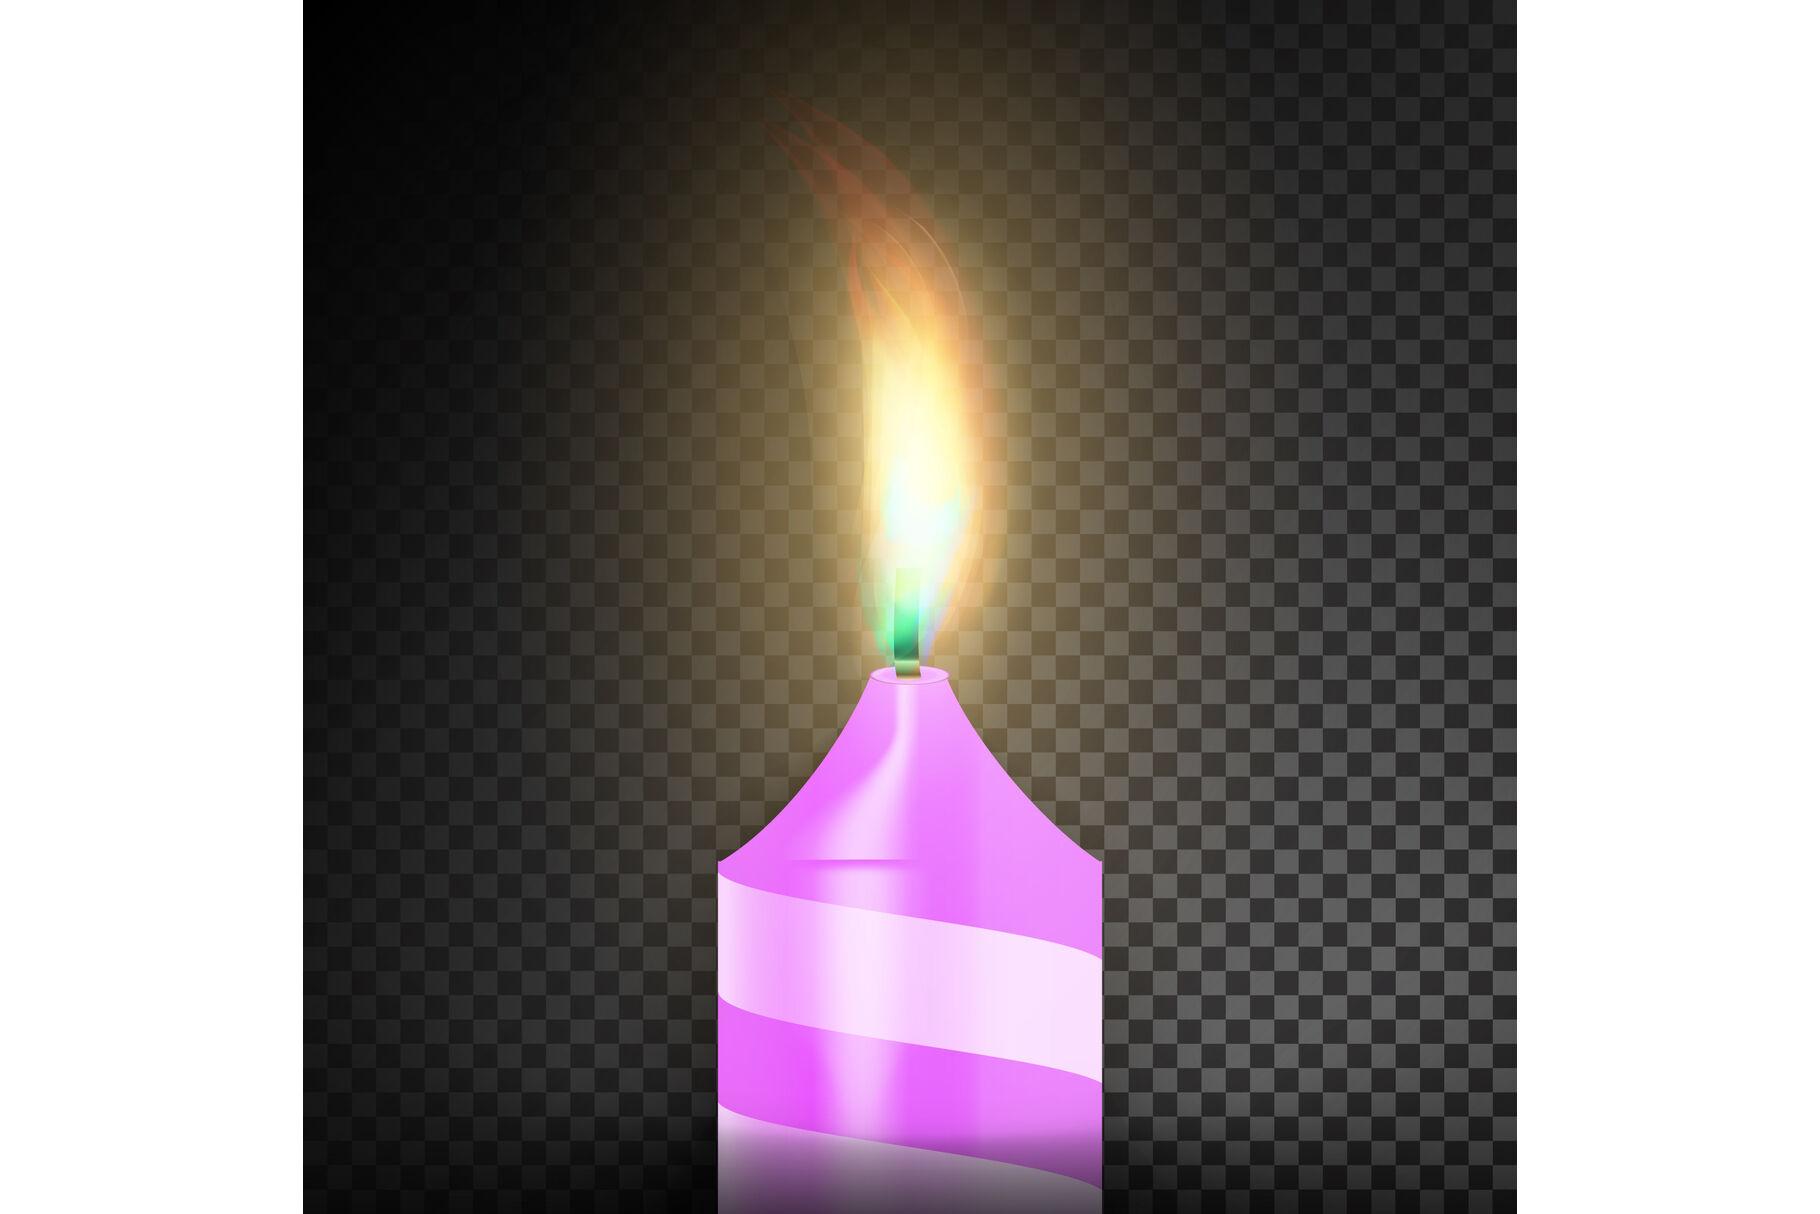 Burning 3d Realistic Dinner Candles Dark Transparent Background